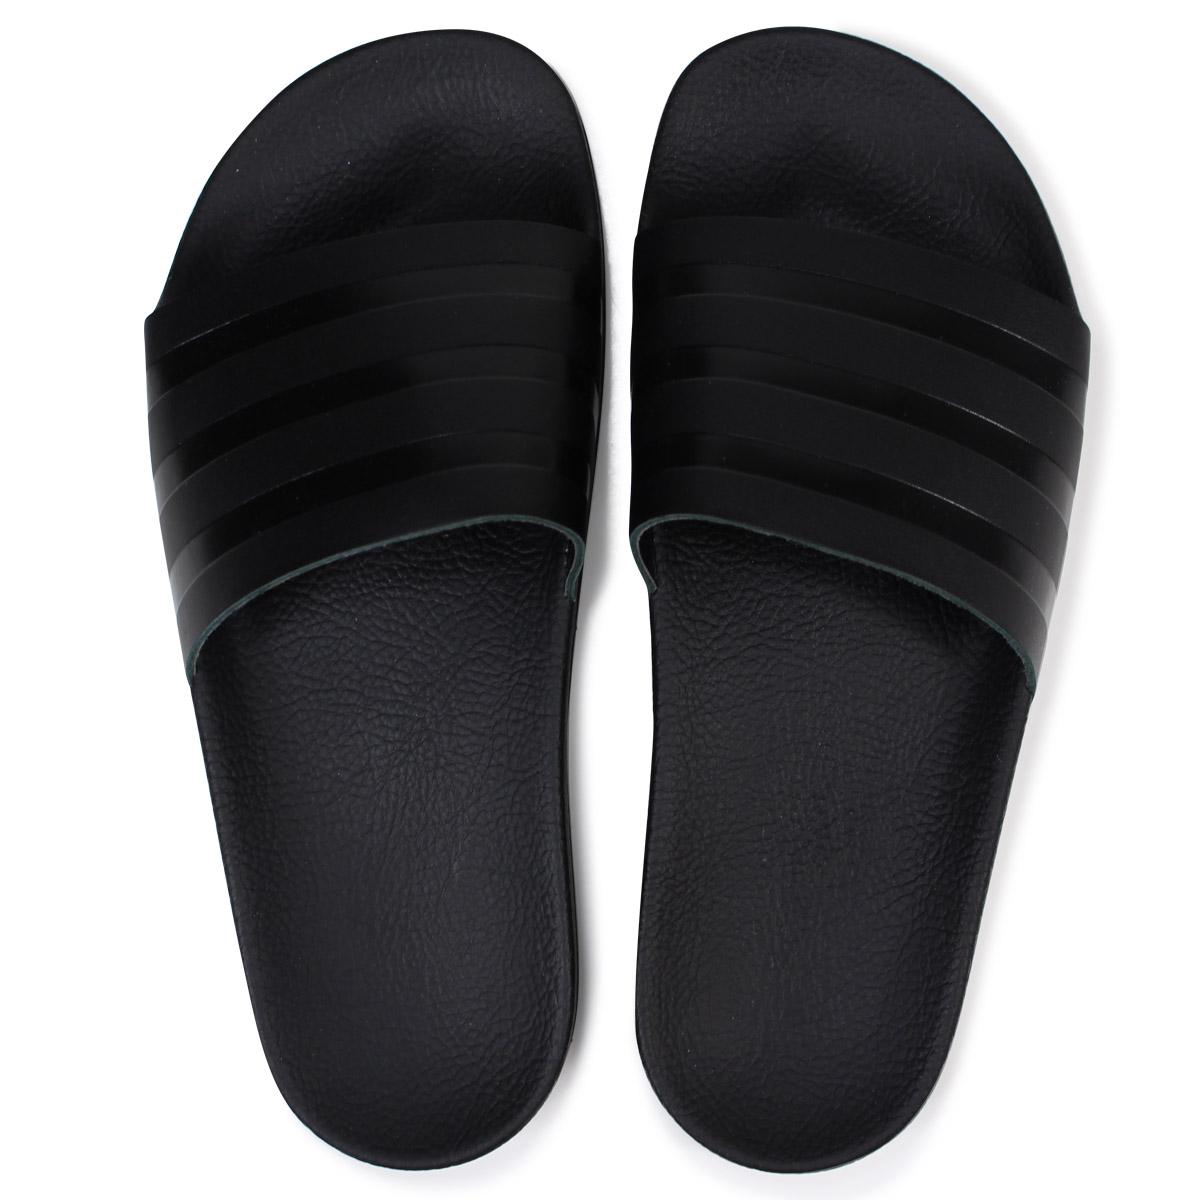 super popular 0f9a3 8f793 adidas Originals ADILETTE SLIDES アディダスアディレッタサンダルシャワーサンダルメンズ CQ3094 black  originals  4 19 Shinnyu load   184